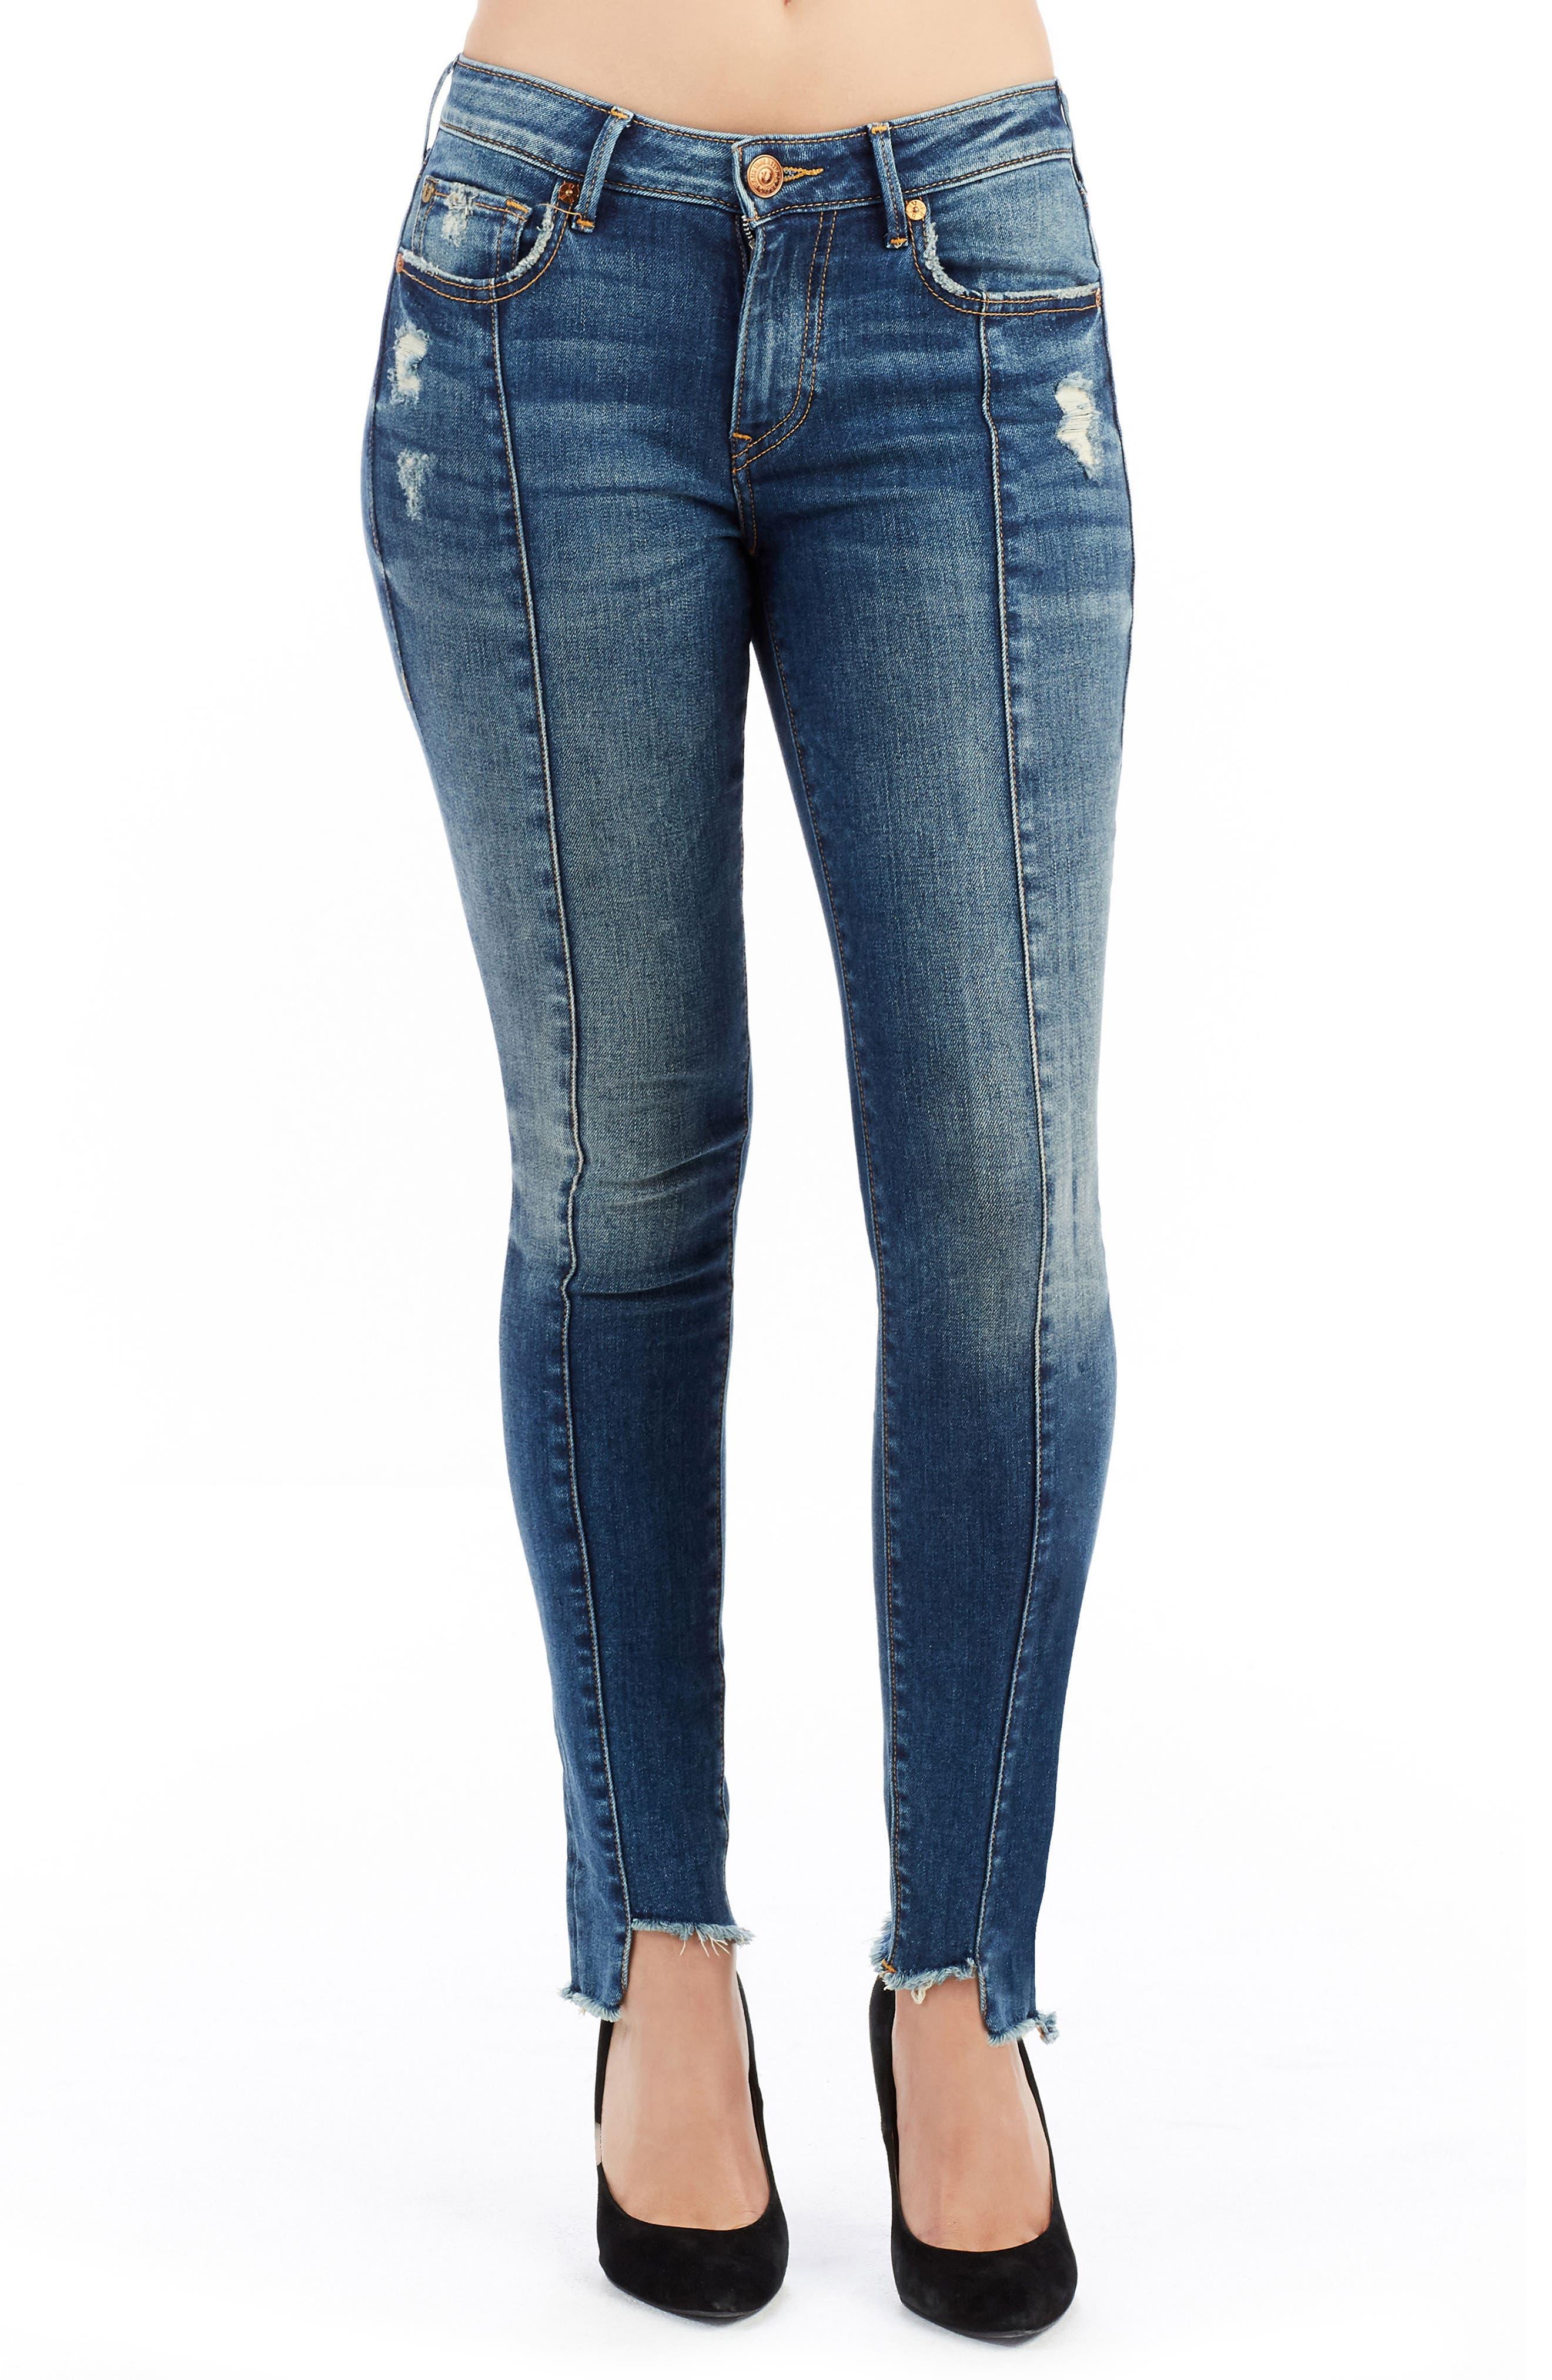 Jennie Curvy Skinny Jeans,                             Main thumbnail 1, color,                             400